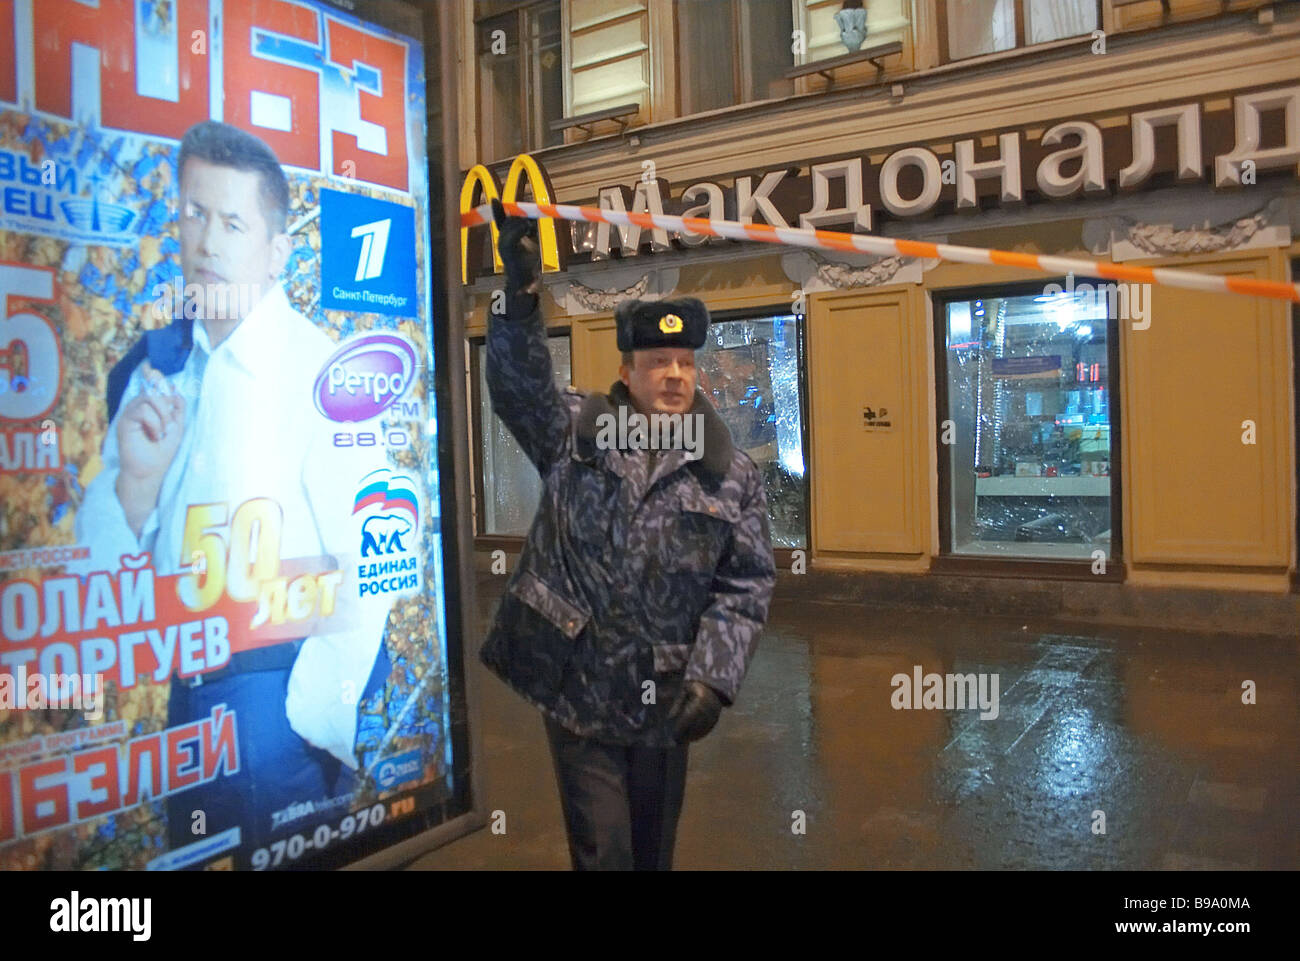 Ein mittlerer Ertrag improvisierten Sprengkörpern ging Fast-Food Restaurant McDonald s auf St. Petersburg s Stockbild